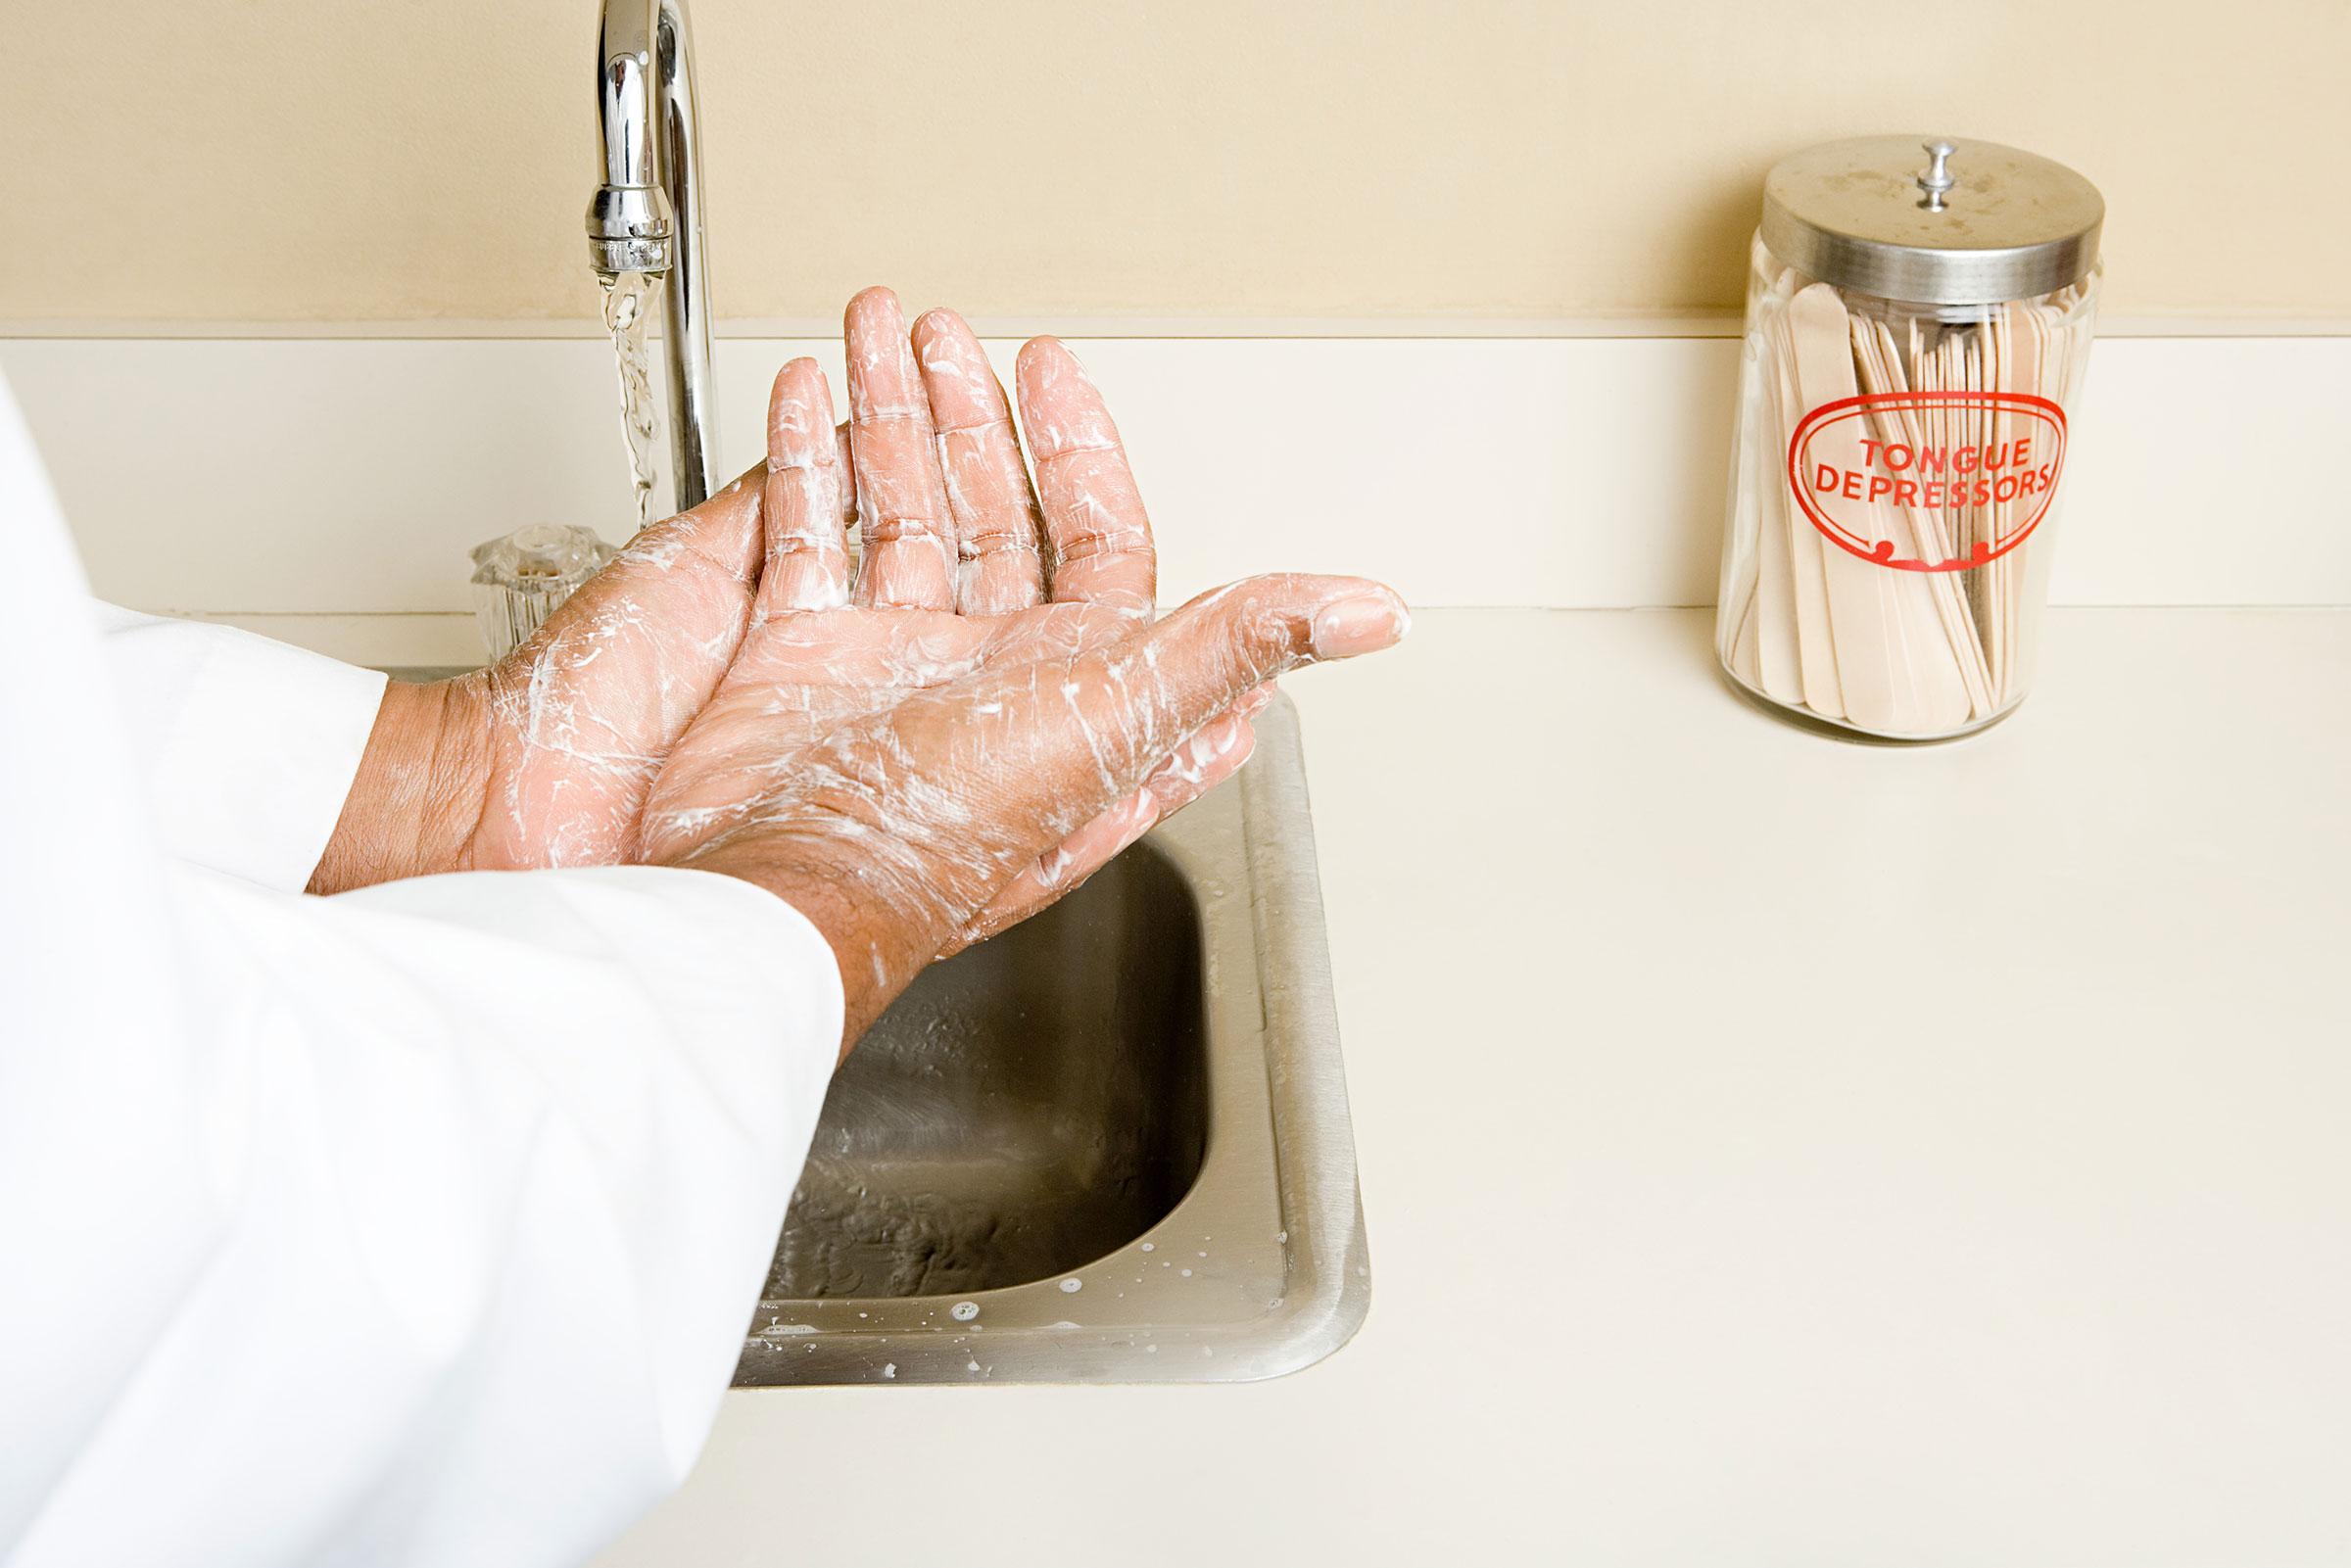 Environmental Cleaning Basics